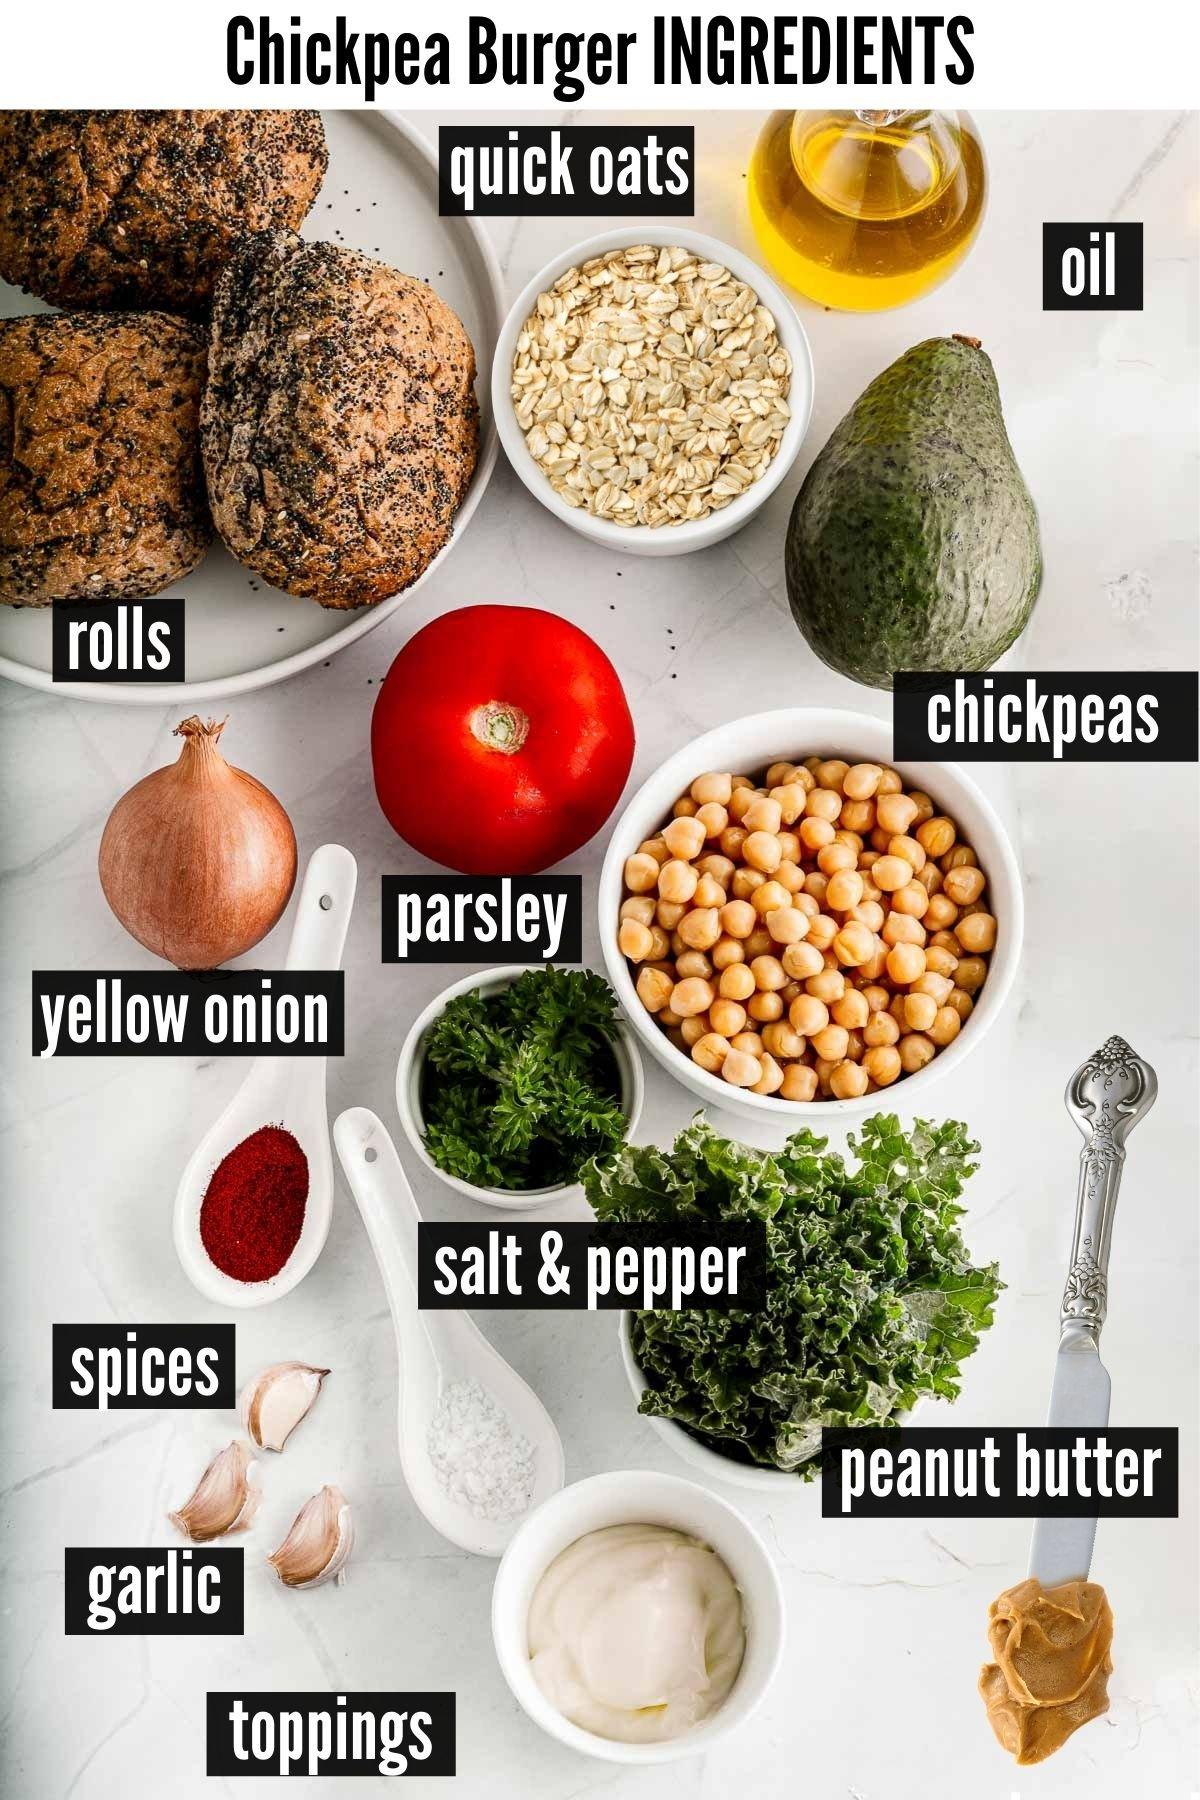 cihckpea burger ingredients